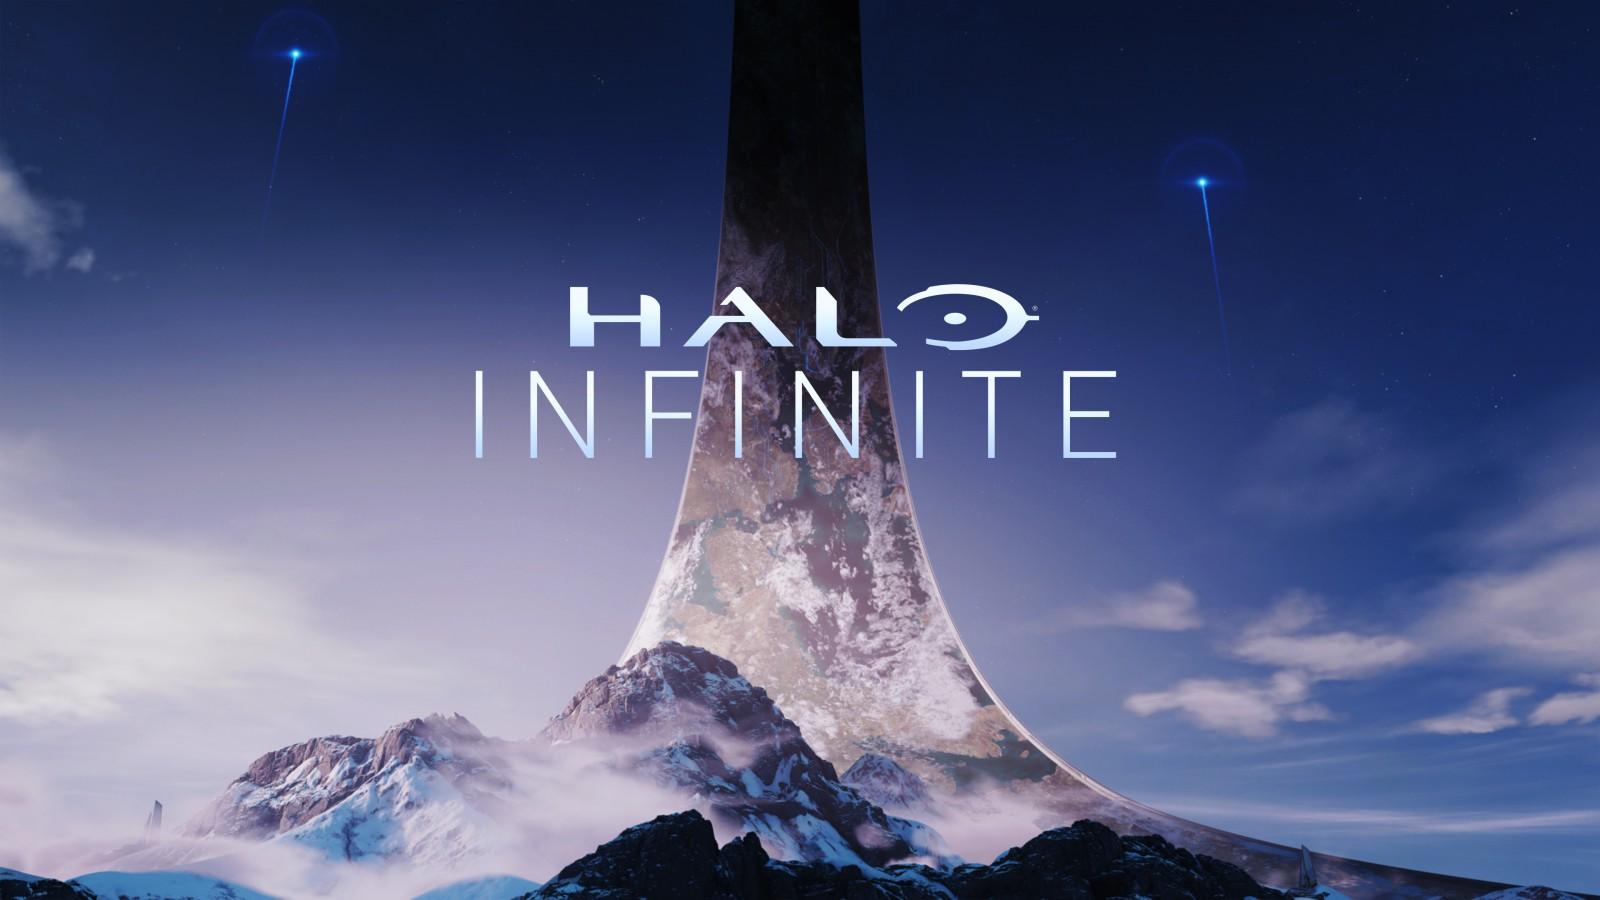 Cute Wallpaper Widescreen Halo Infinite E3 2018 4k Wallpapers Hd Wallpapers Id